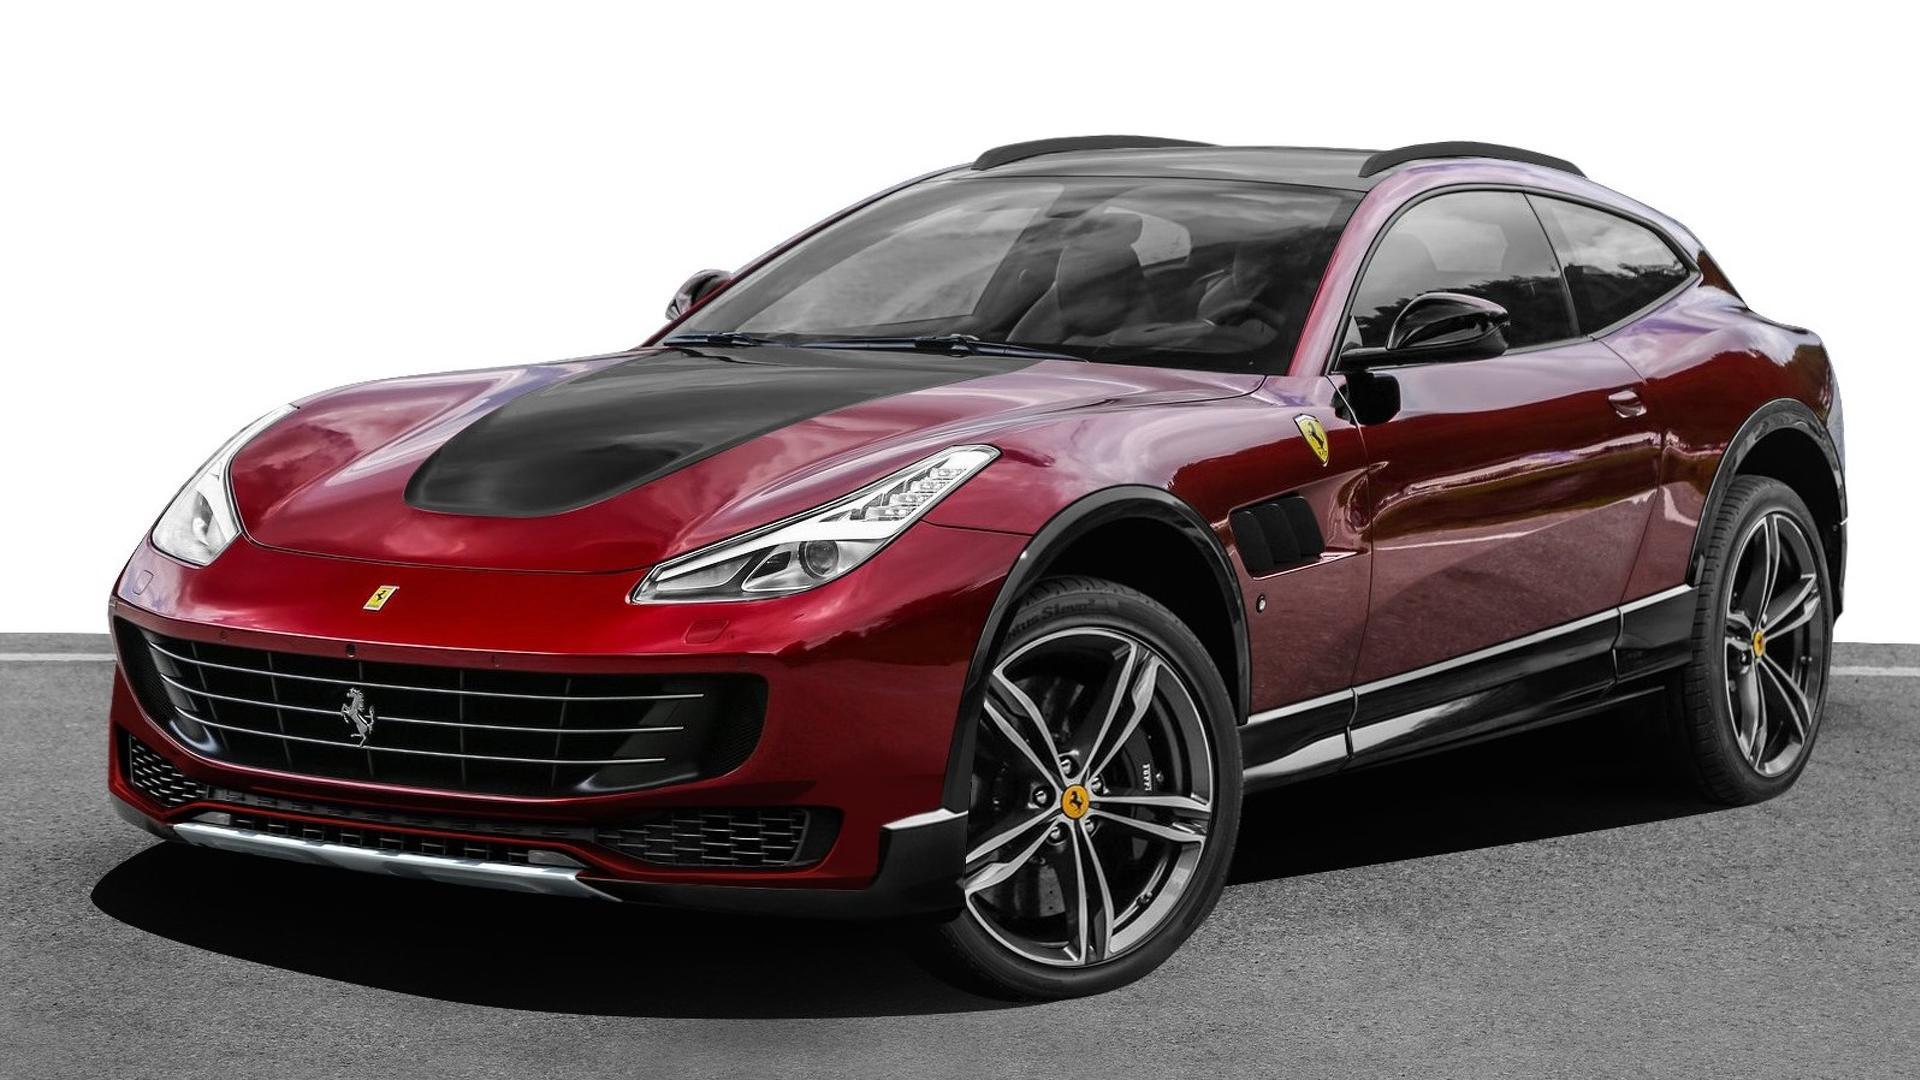 Ferrari джип